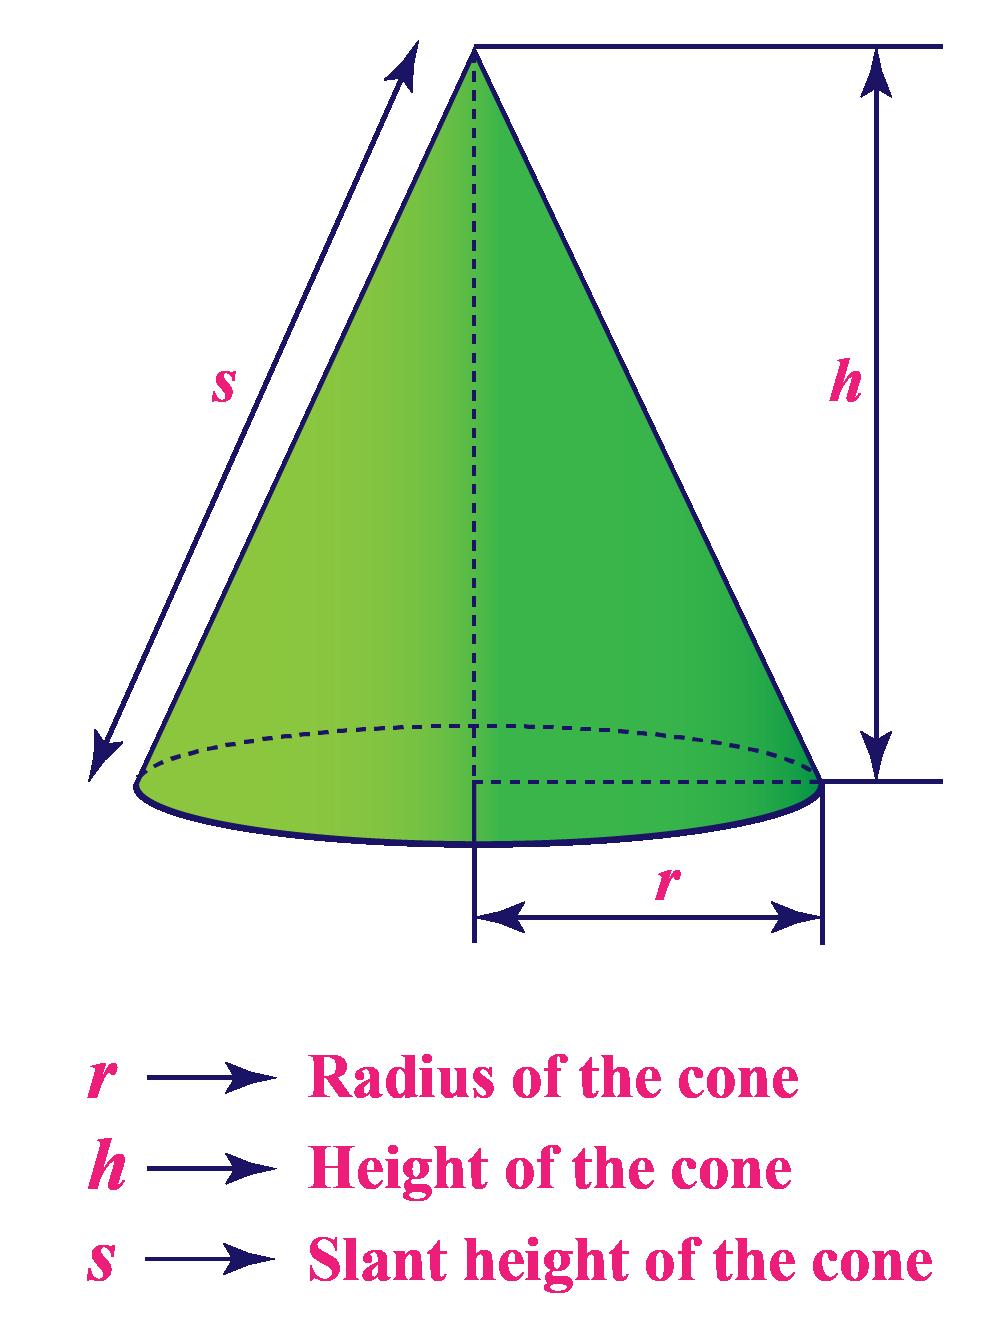 parameters of cone - height, slant height, radius